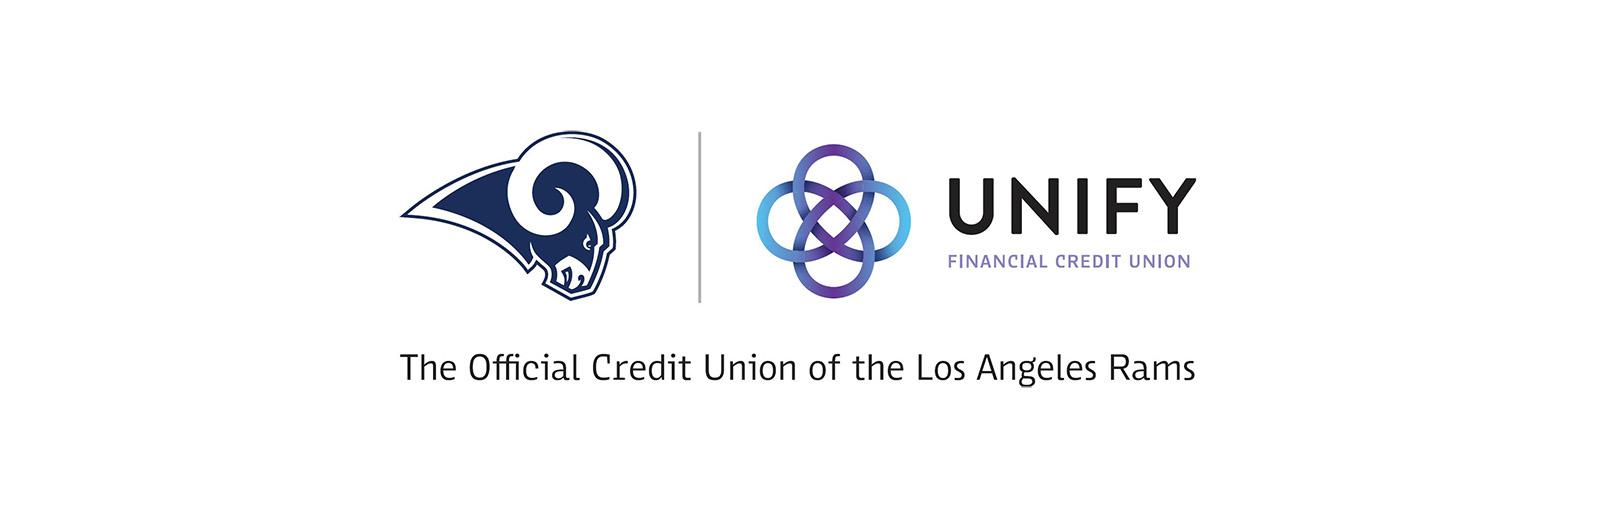 unify logo.JPG